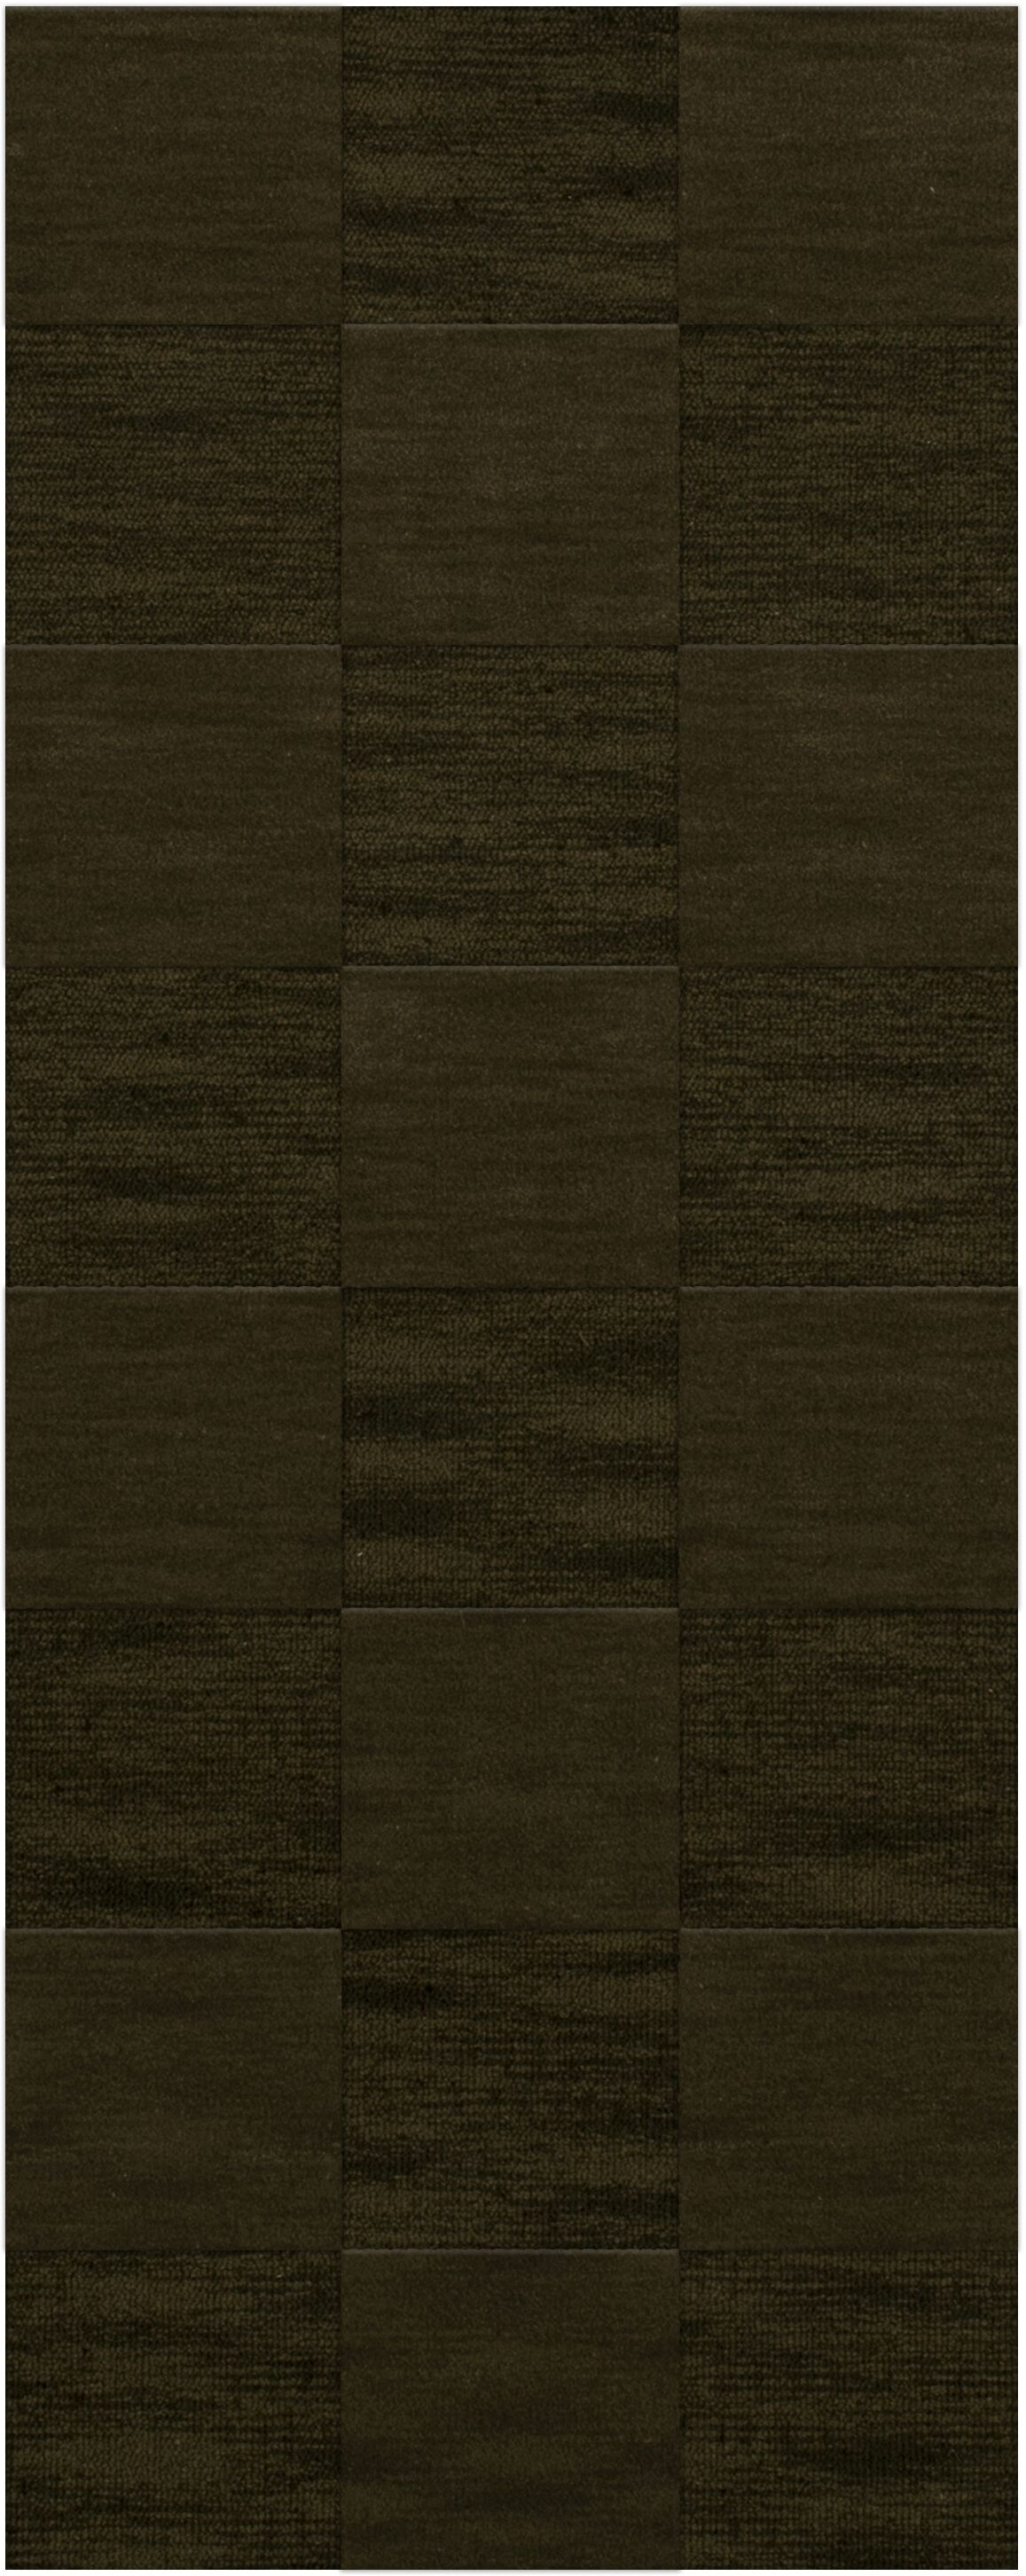 Dover Tufted Wool Olive Area Rug Rug Size: Runner 2'6